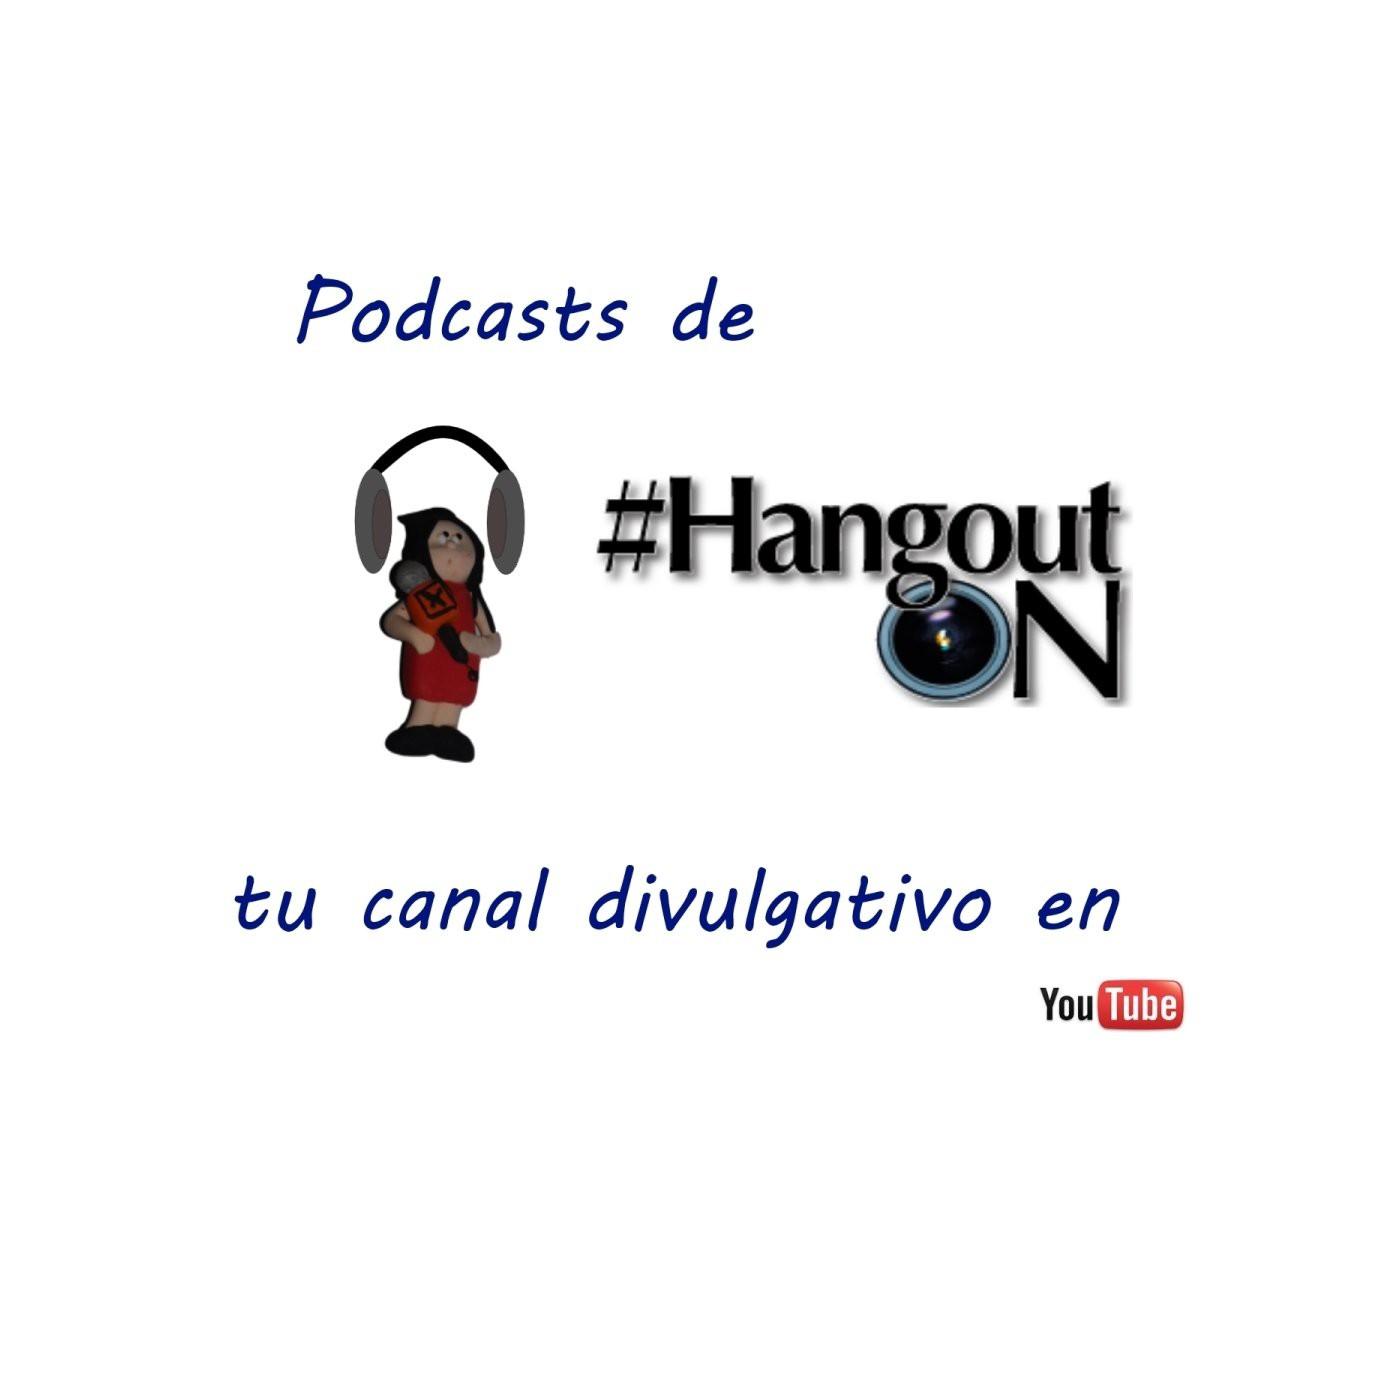 <![CDATA[HangoutON Podcast]]>